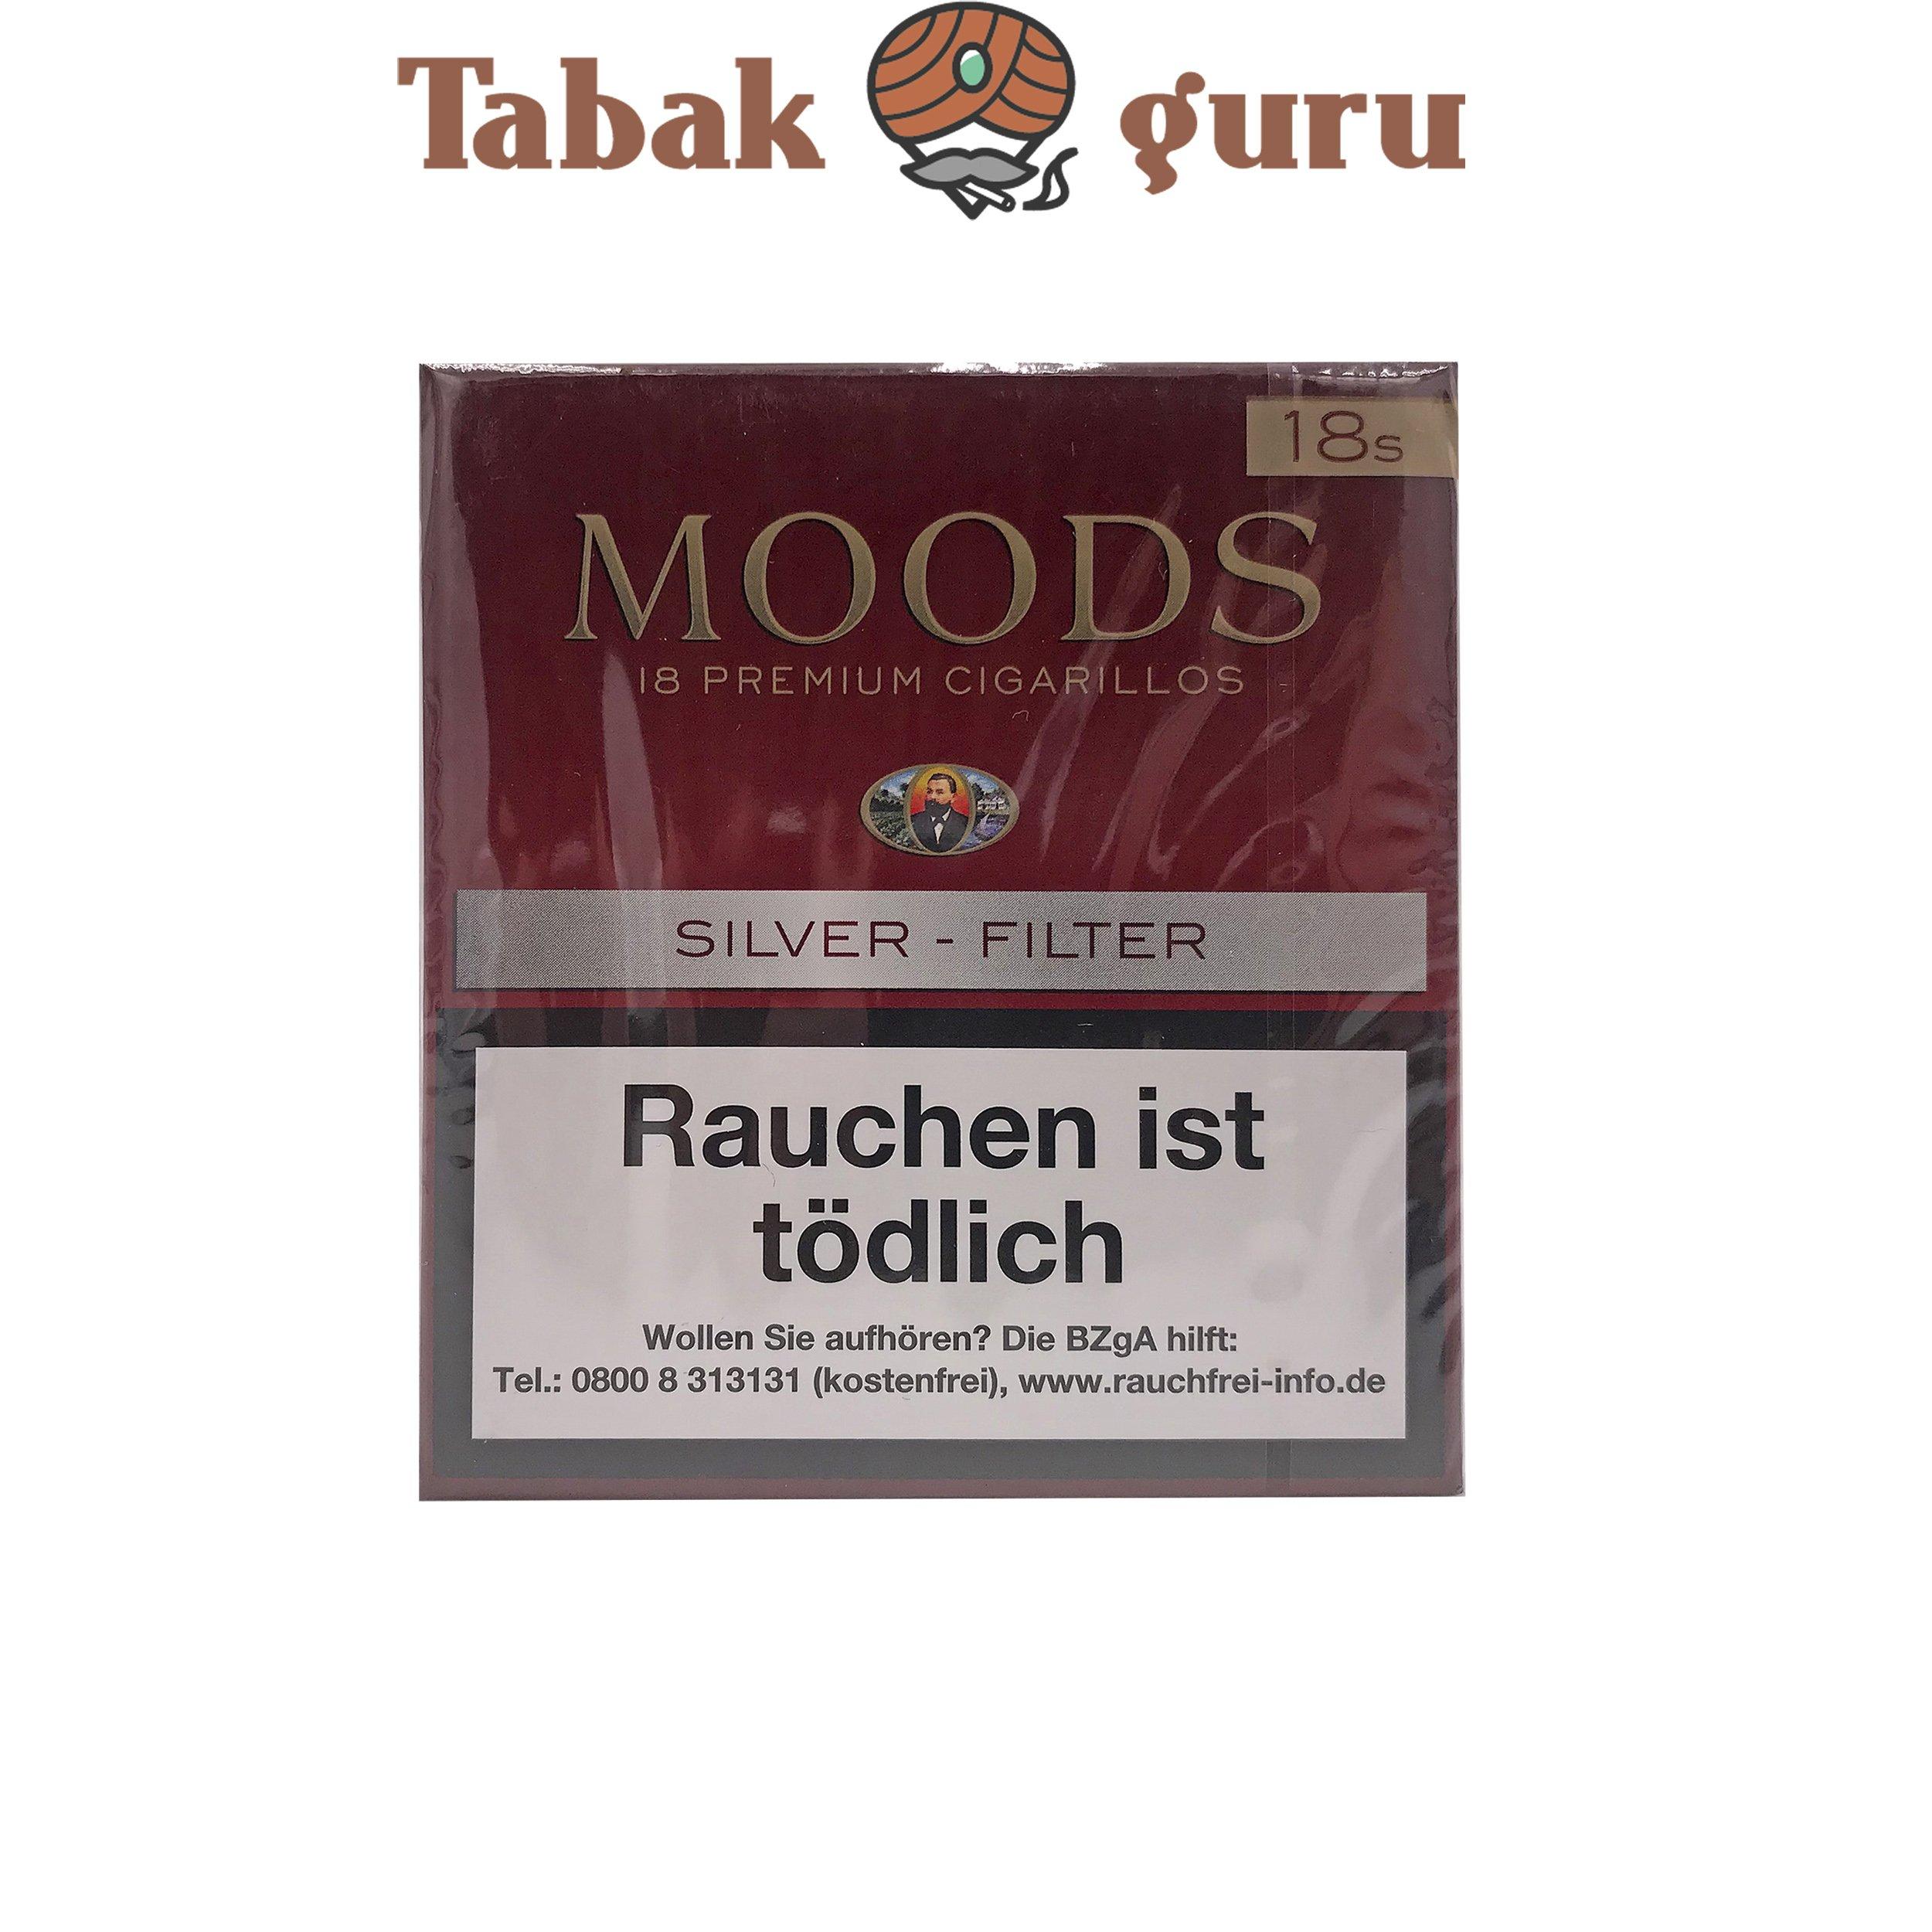 Moods Silver Filterzigarillos a 18 Stück